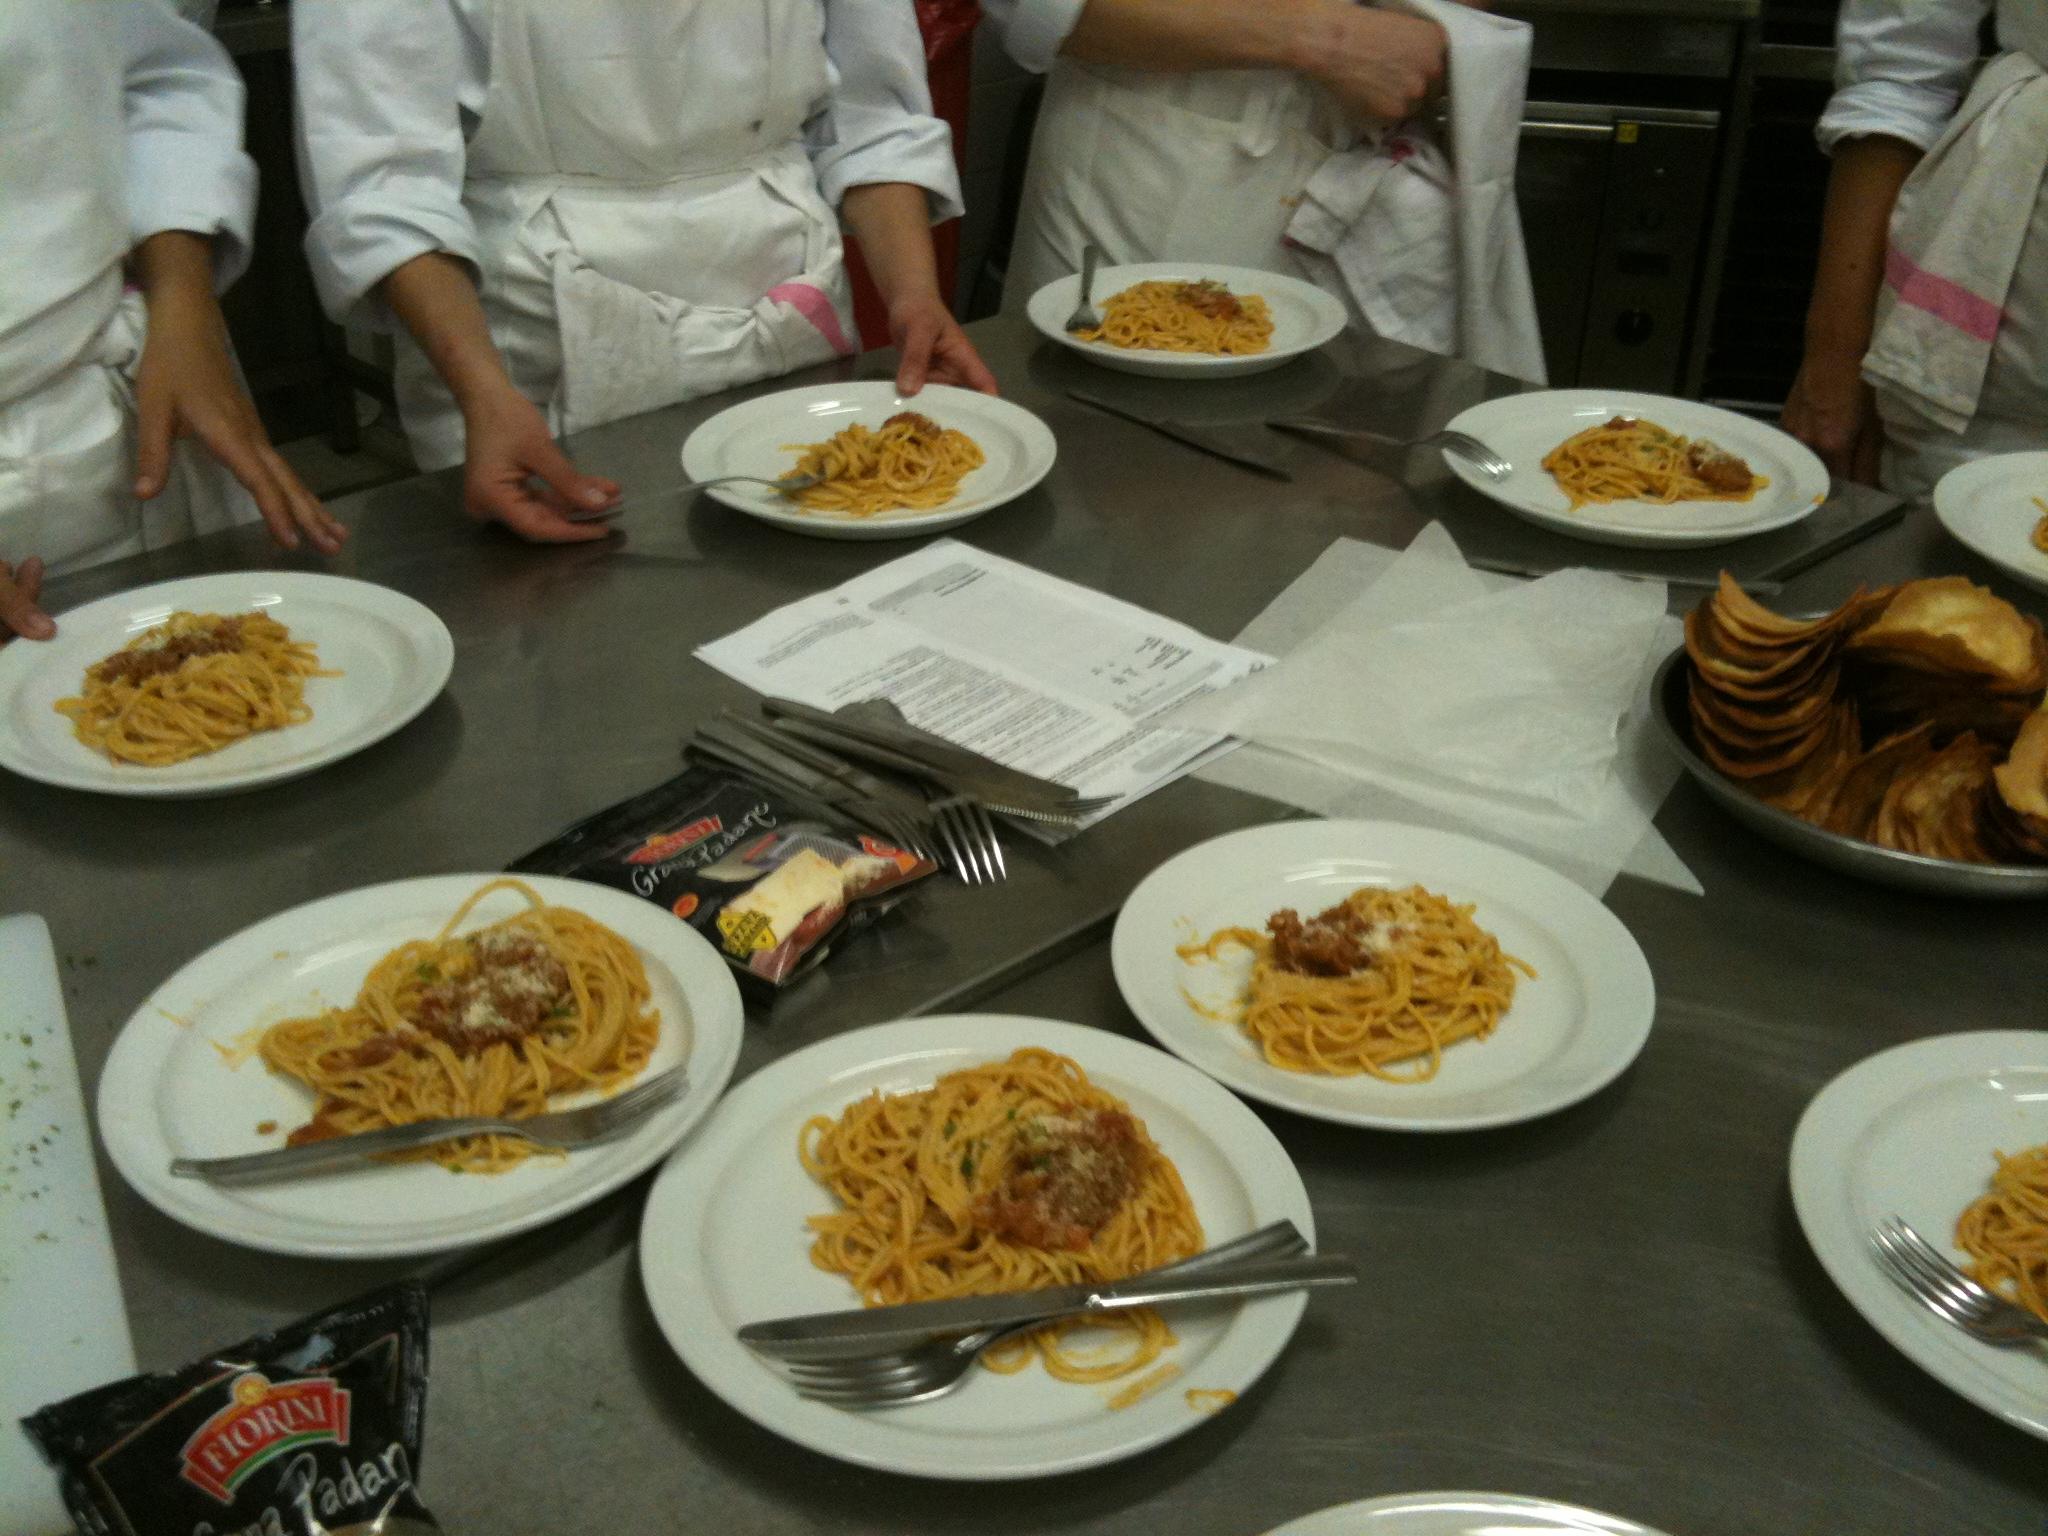 1er cours de cap de cuisine over cook e for Resultat cap cuisine